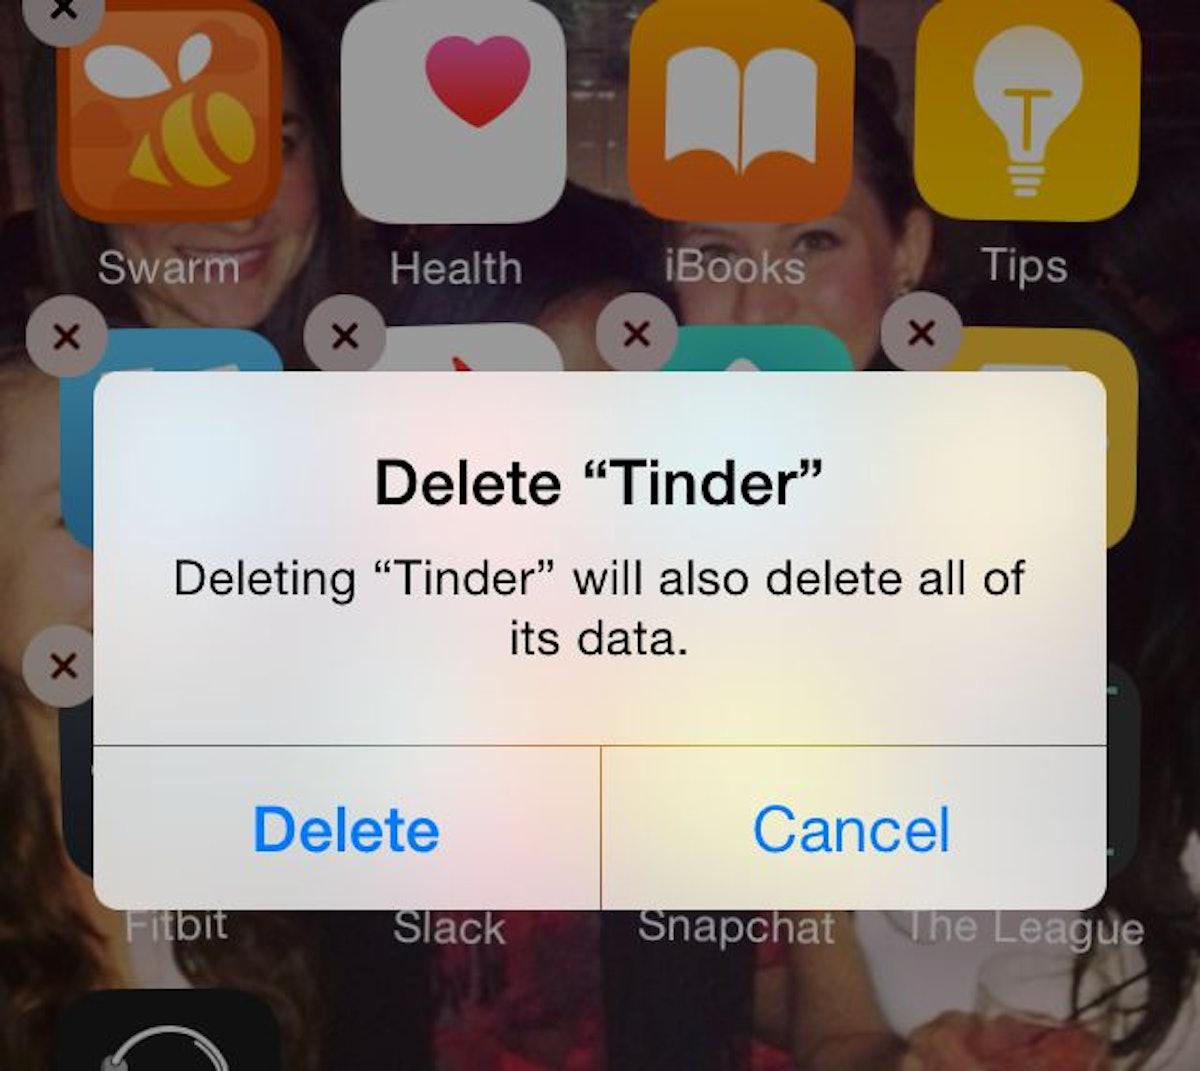 delete flirt hookup account